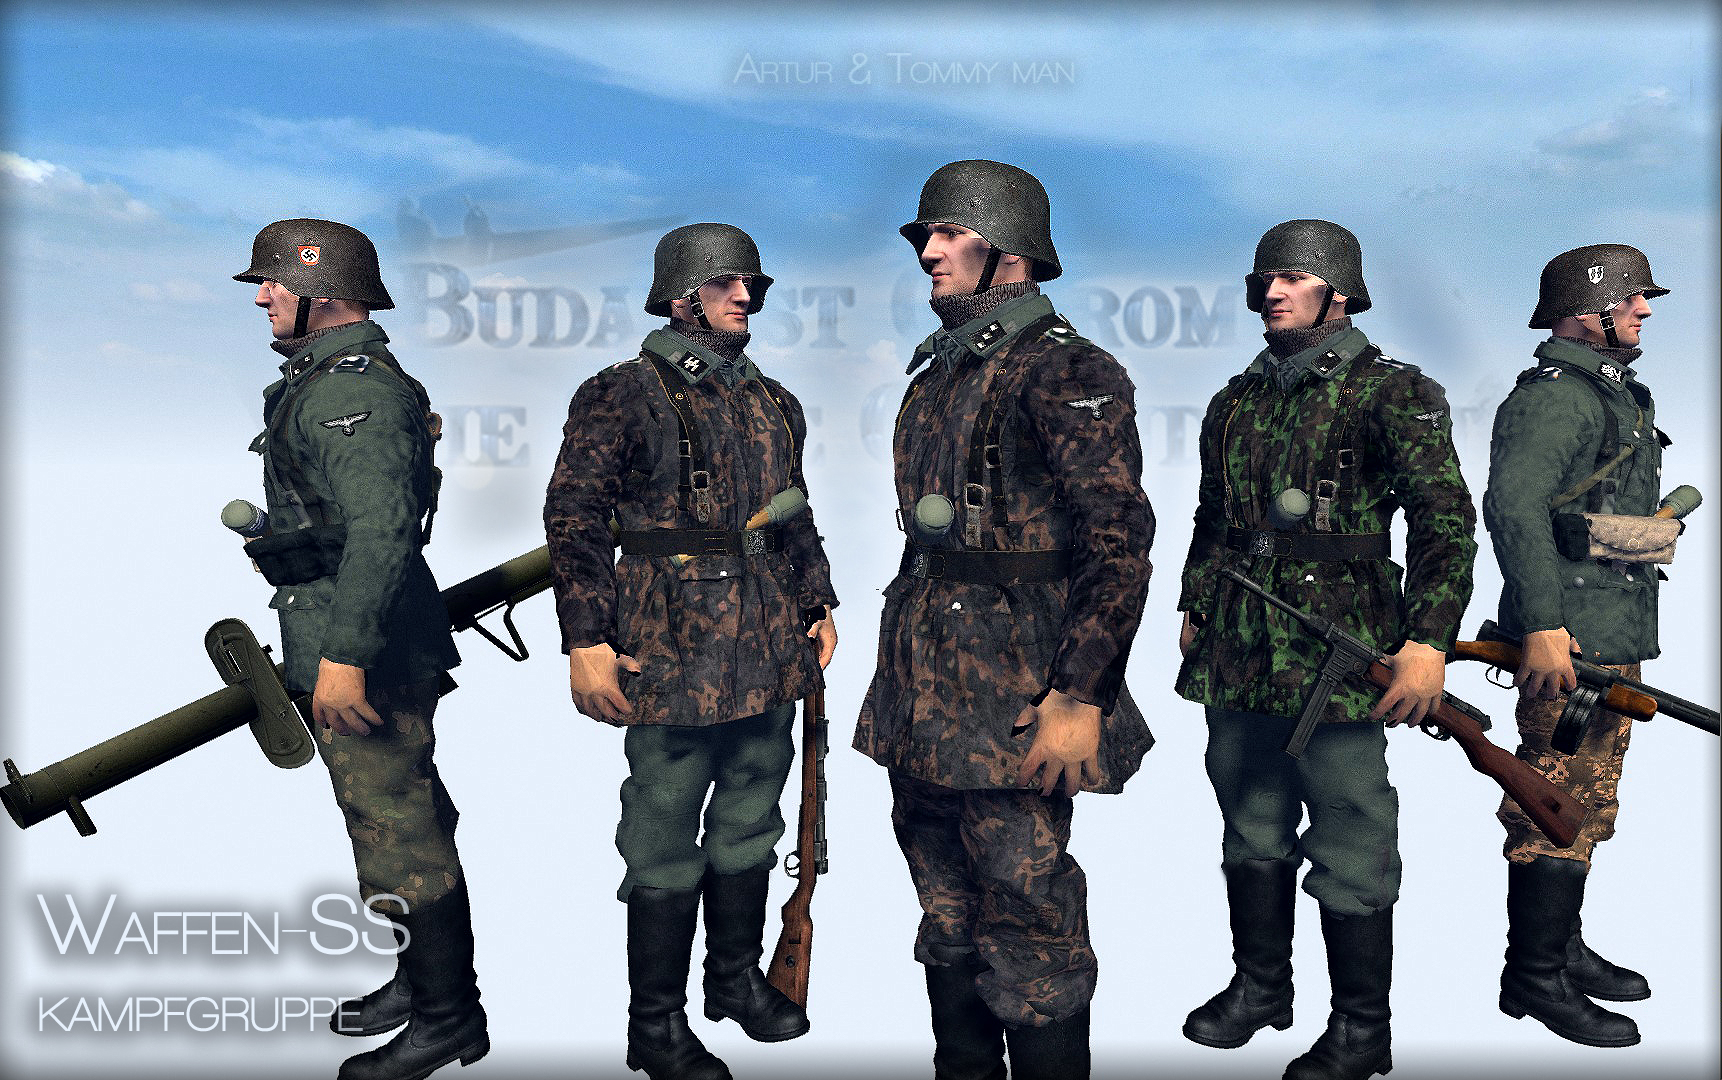 Waffen ss,Budapest siege,1944-45,ostrom